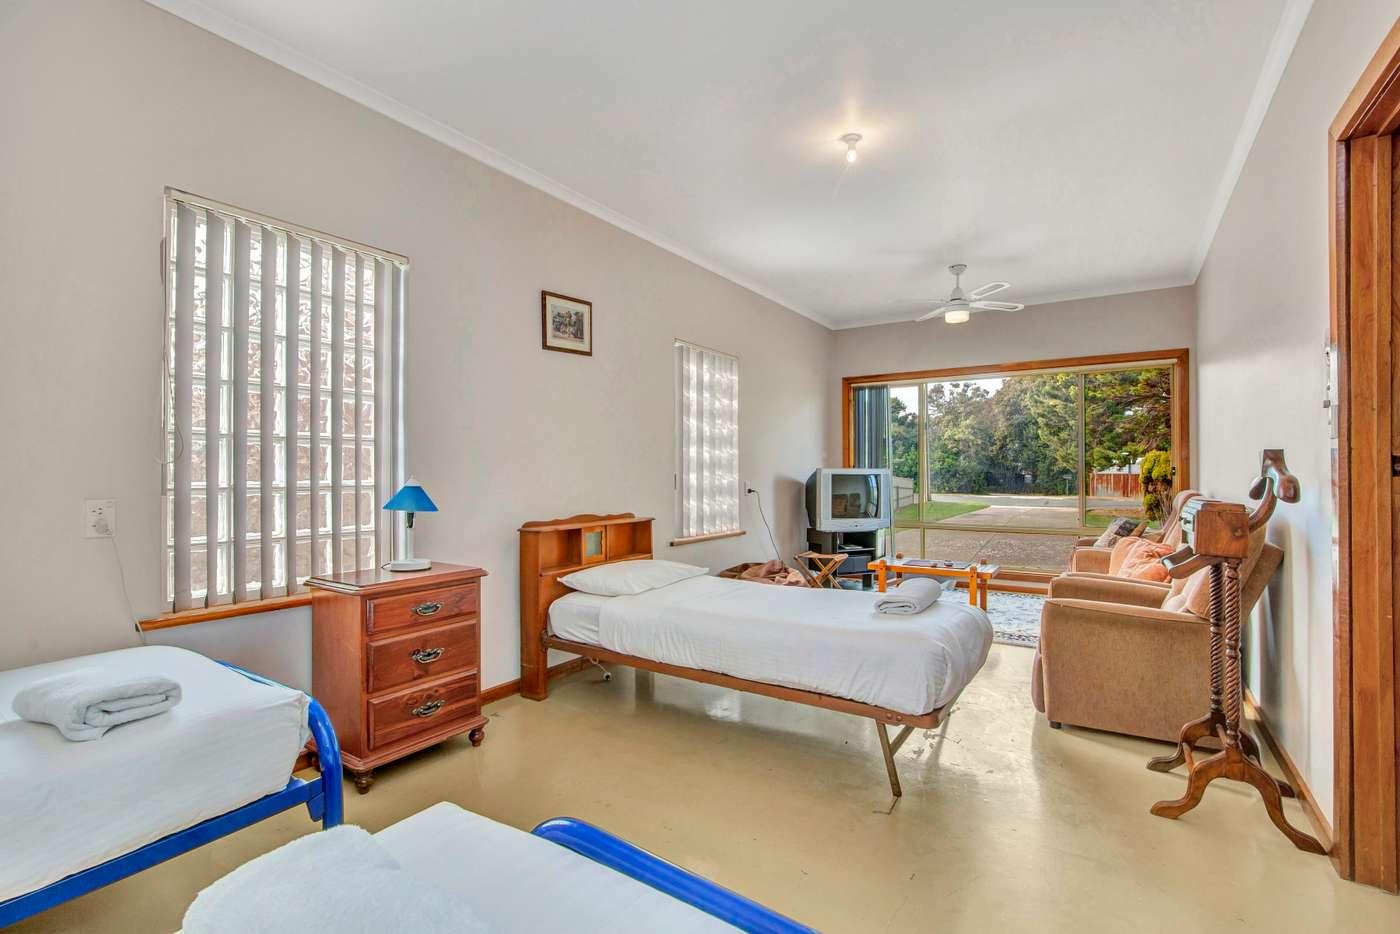 Sixth view of Homely house listing, 60 Coolangatta Drive, Aldinga Beach SA 5173